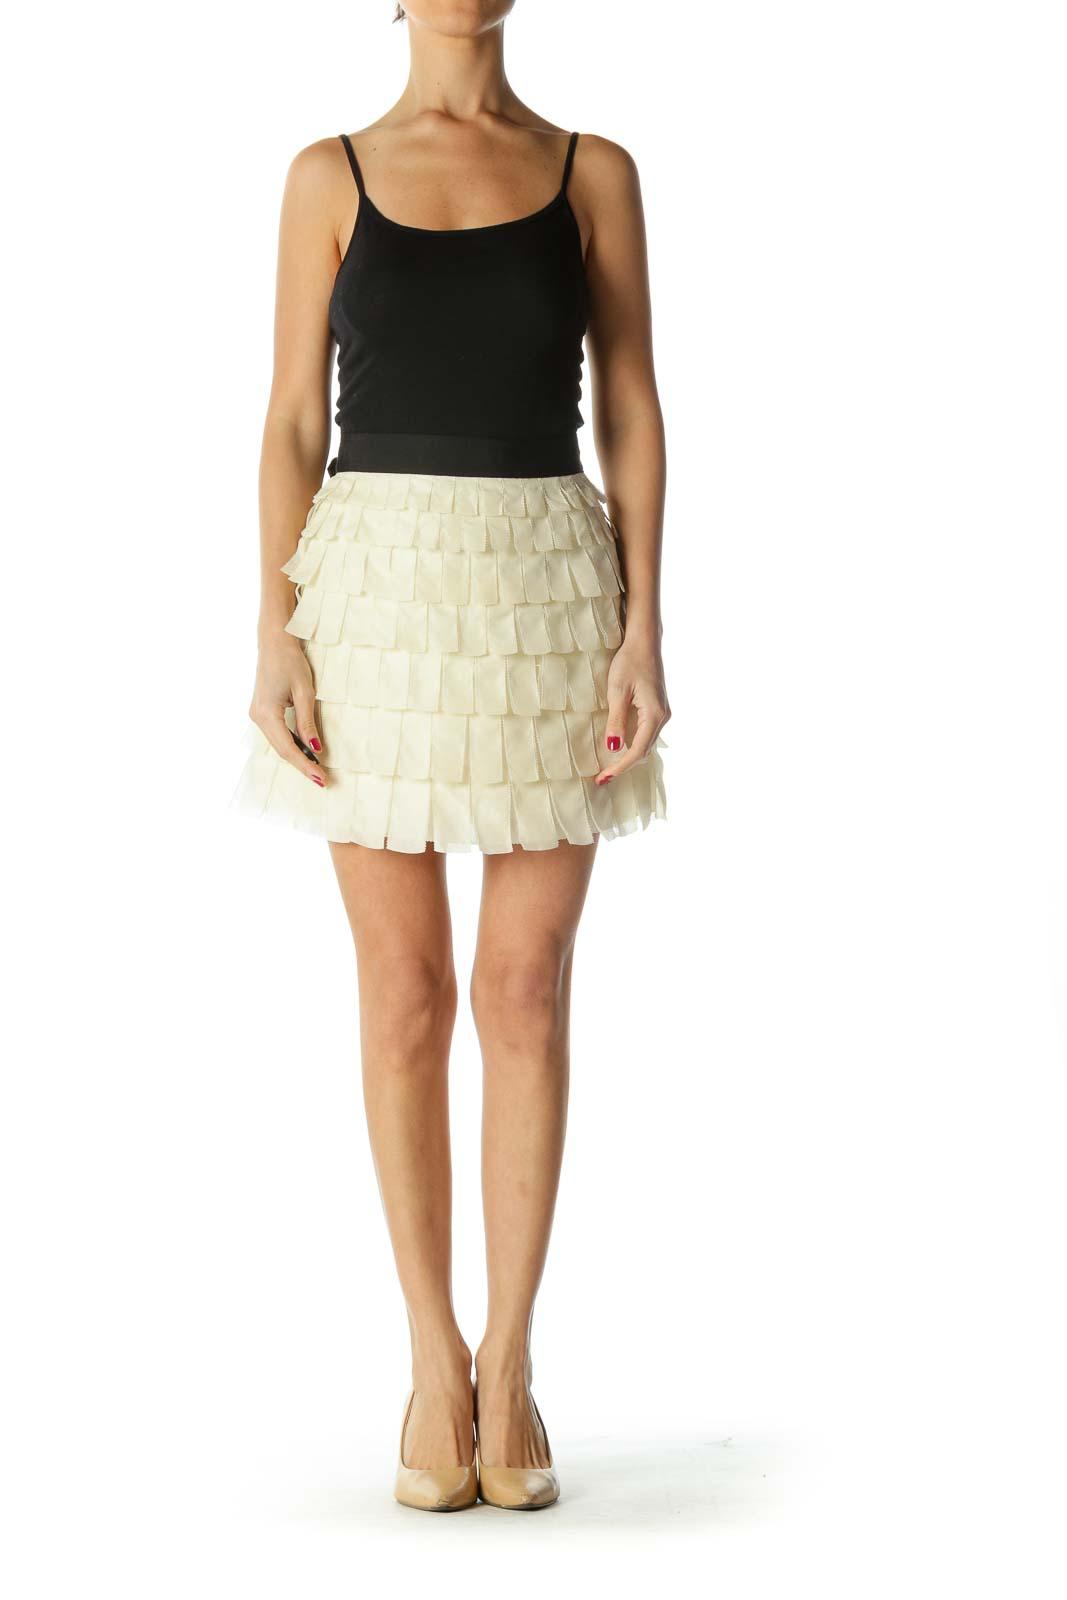 Cream Black Layered Appliques Skirt